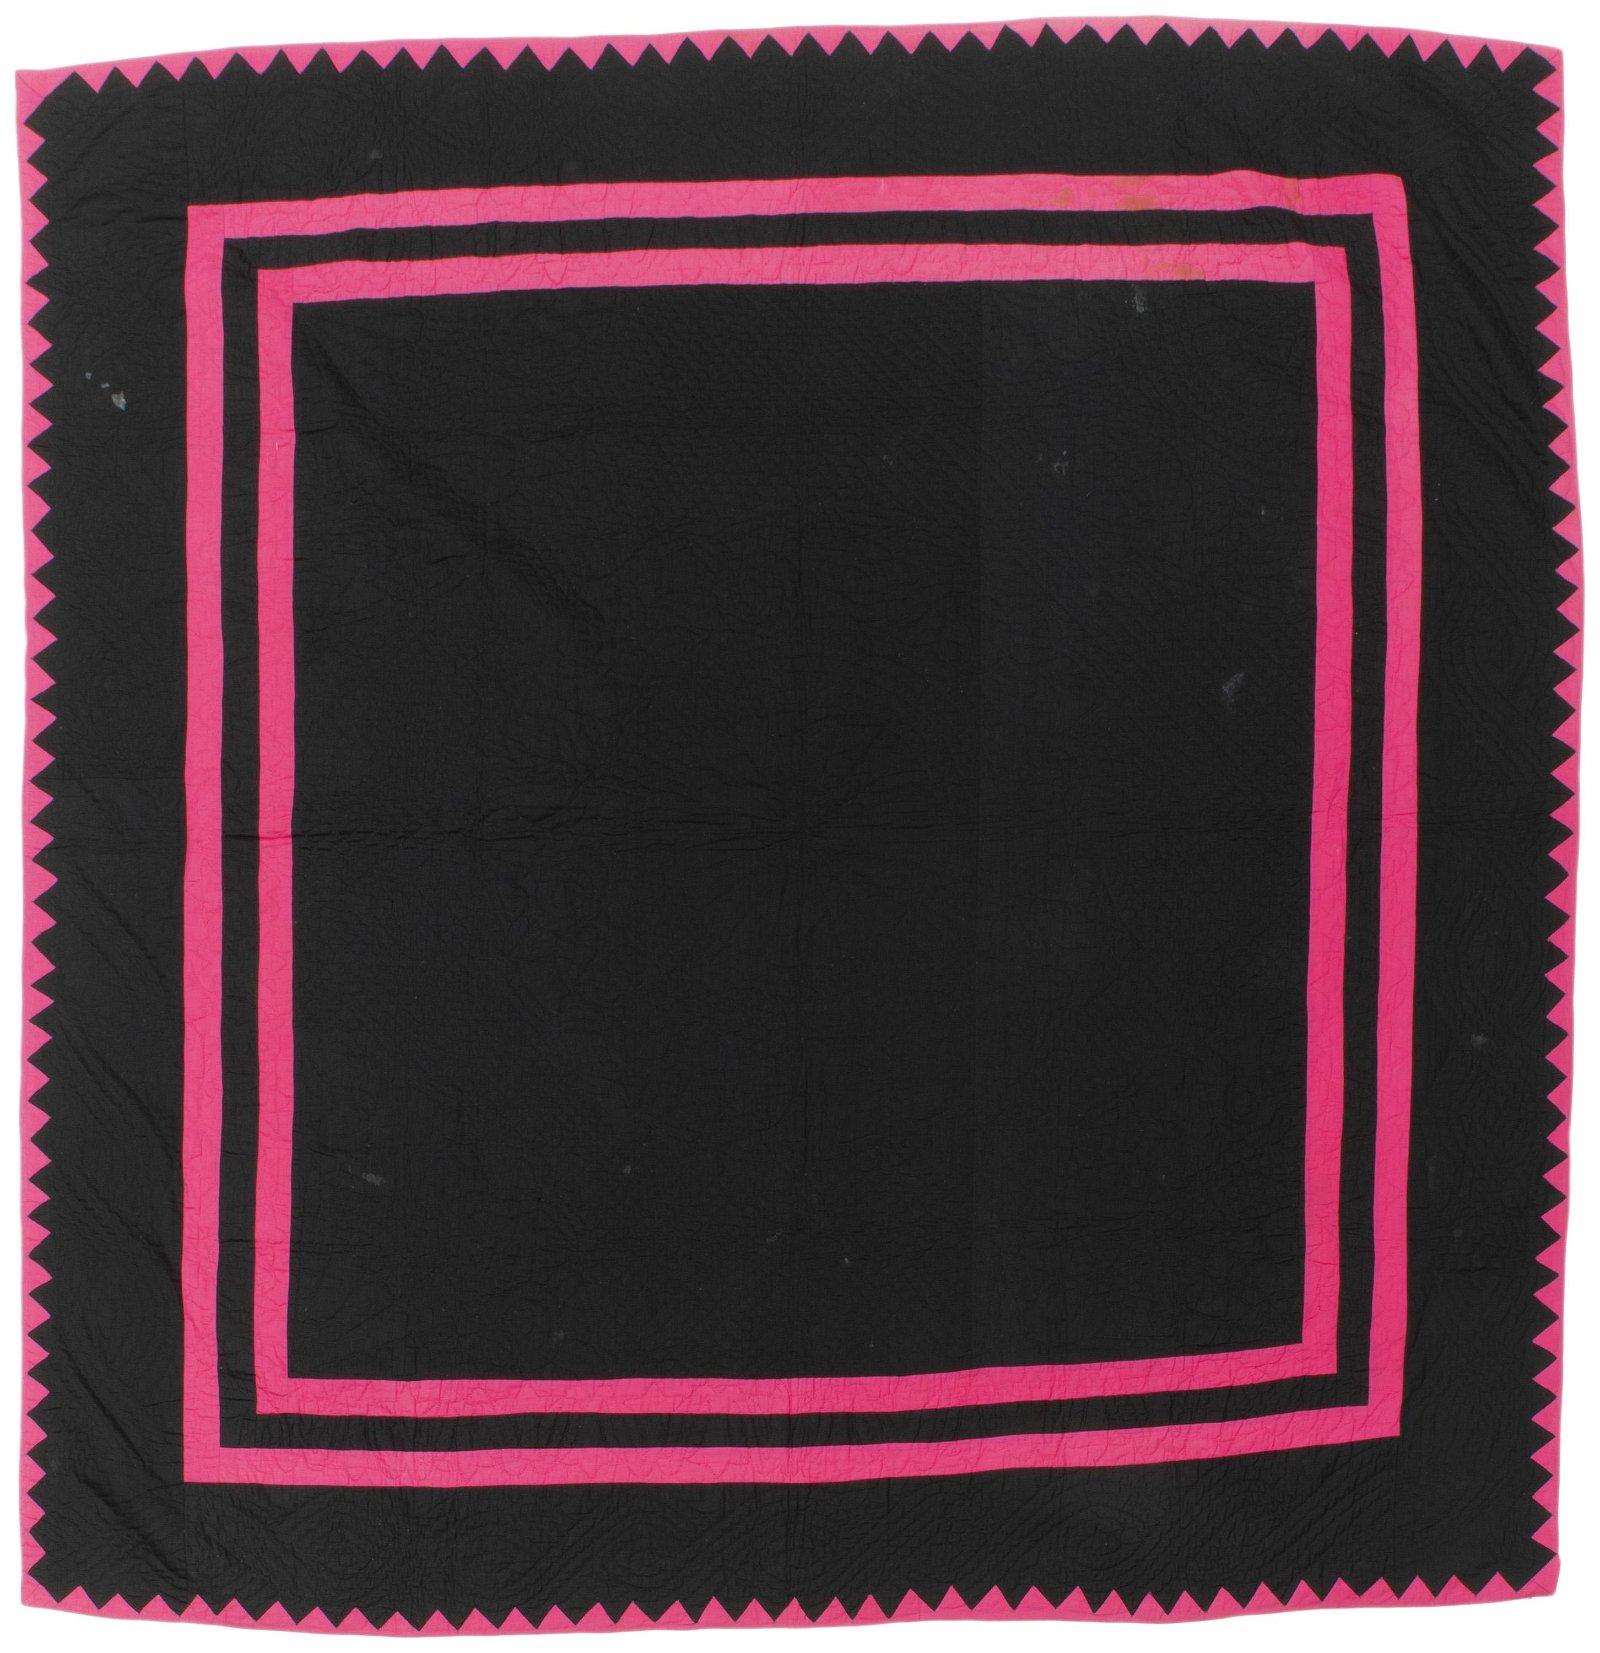 An Amish Window Pane/ Plain quilt